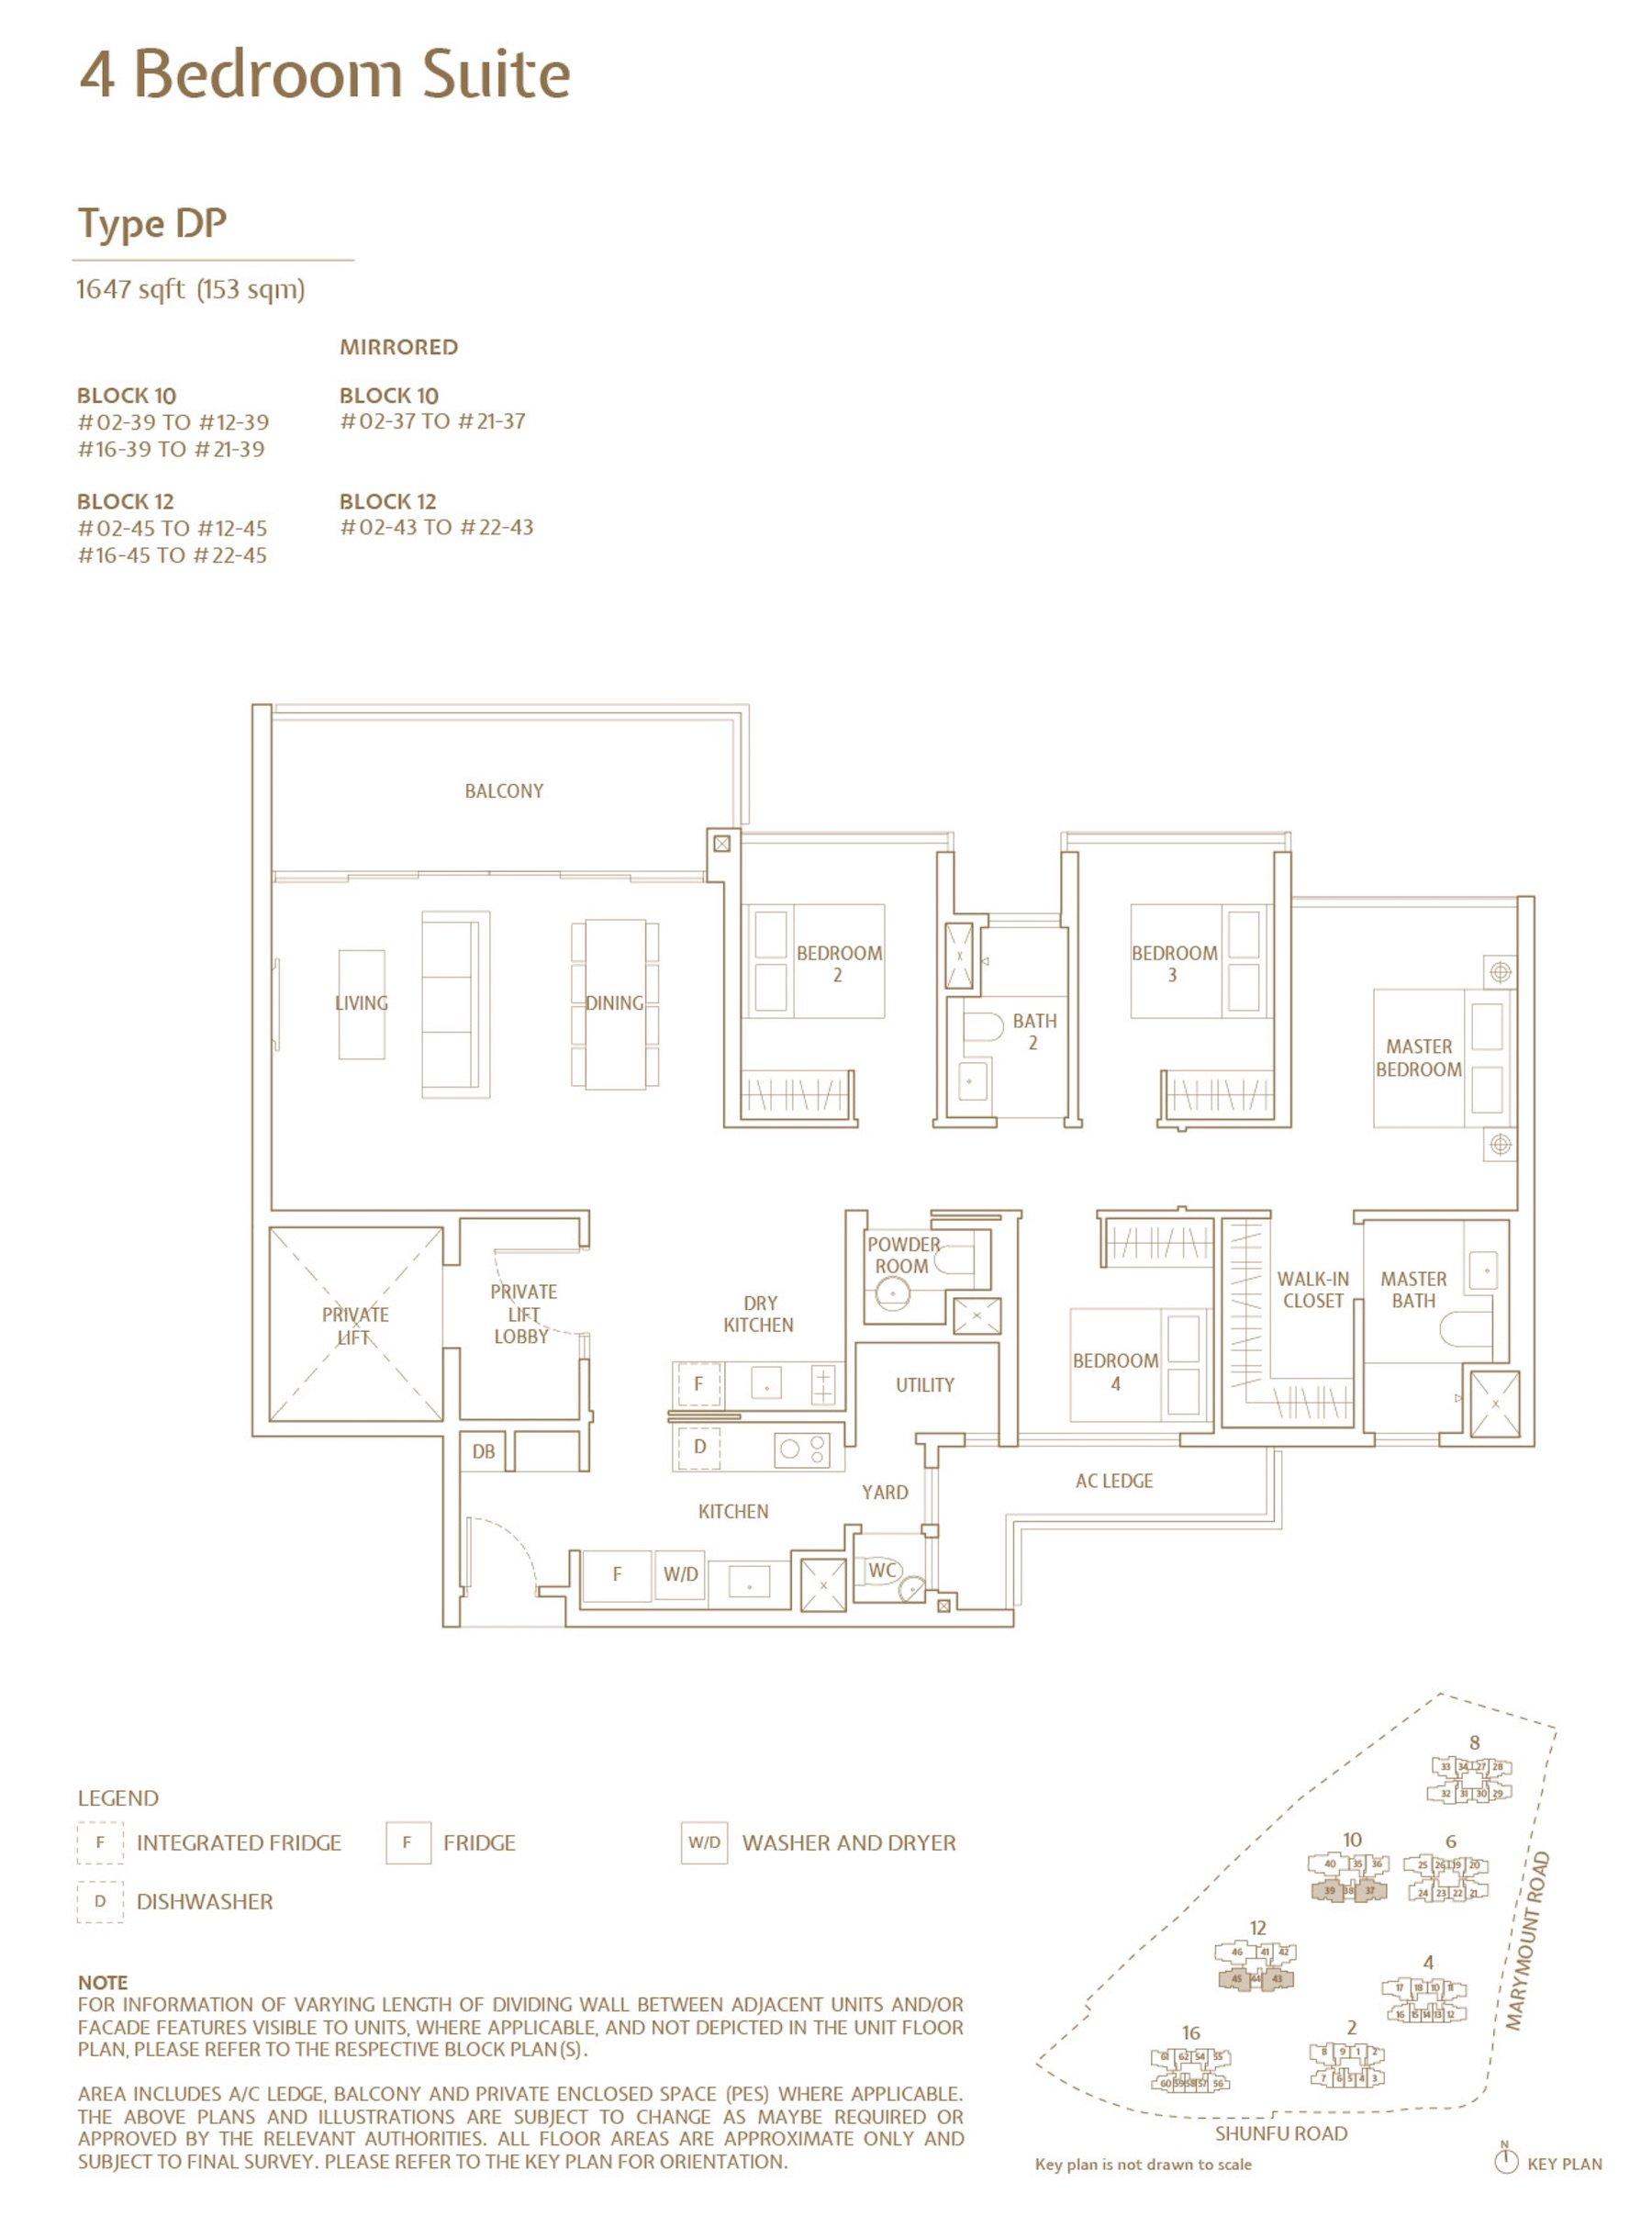 Jadescape 顺福轩 condo 4 bedroom type DP